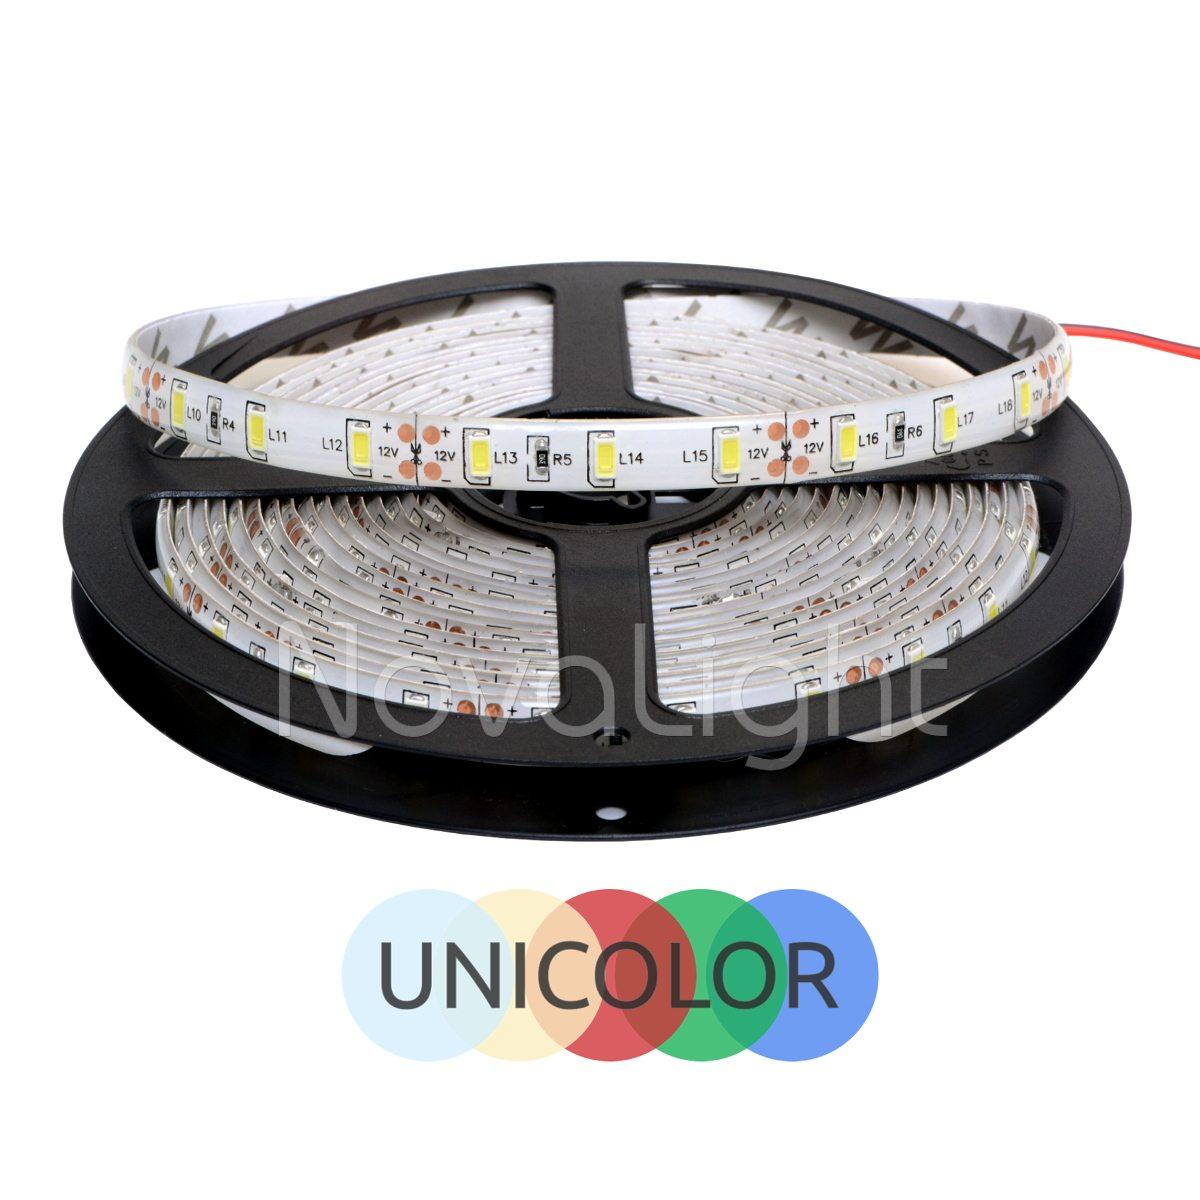 Portada de tira con 300 LED SMD 5630 Unicolor